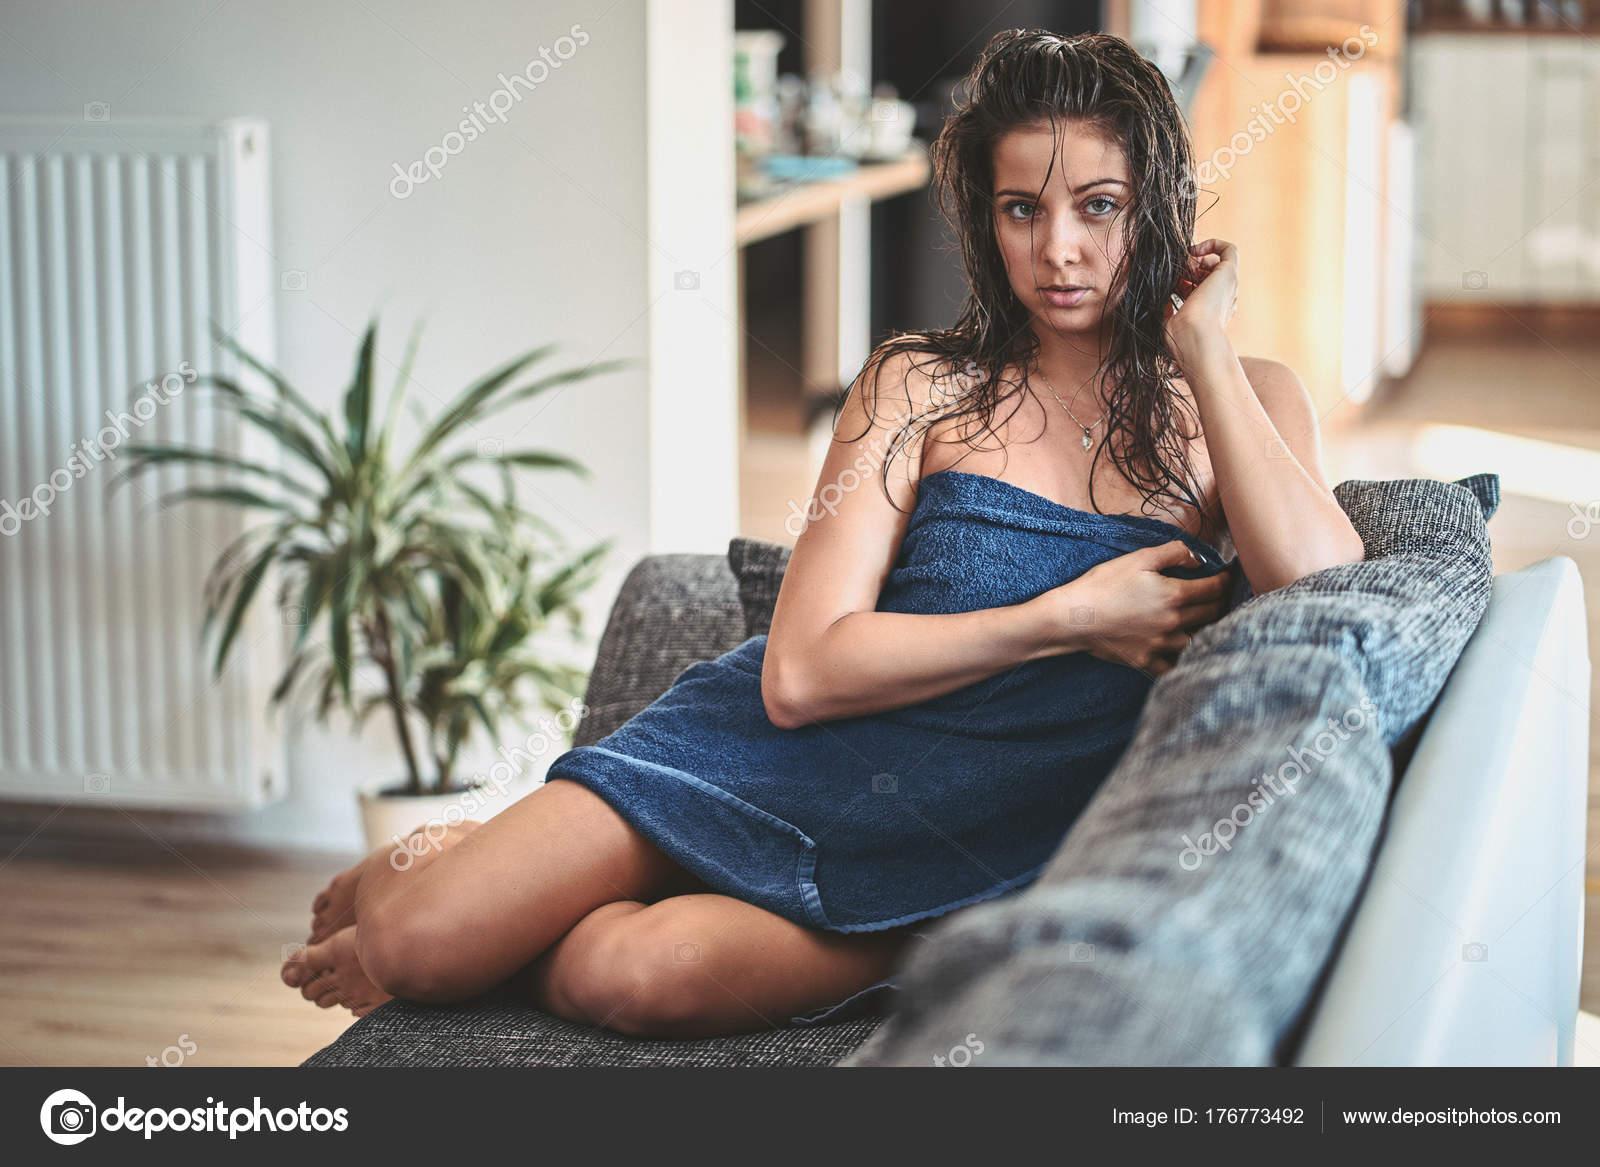 Chinese girls nude photos